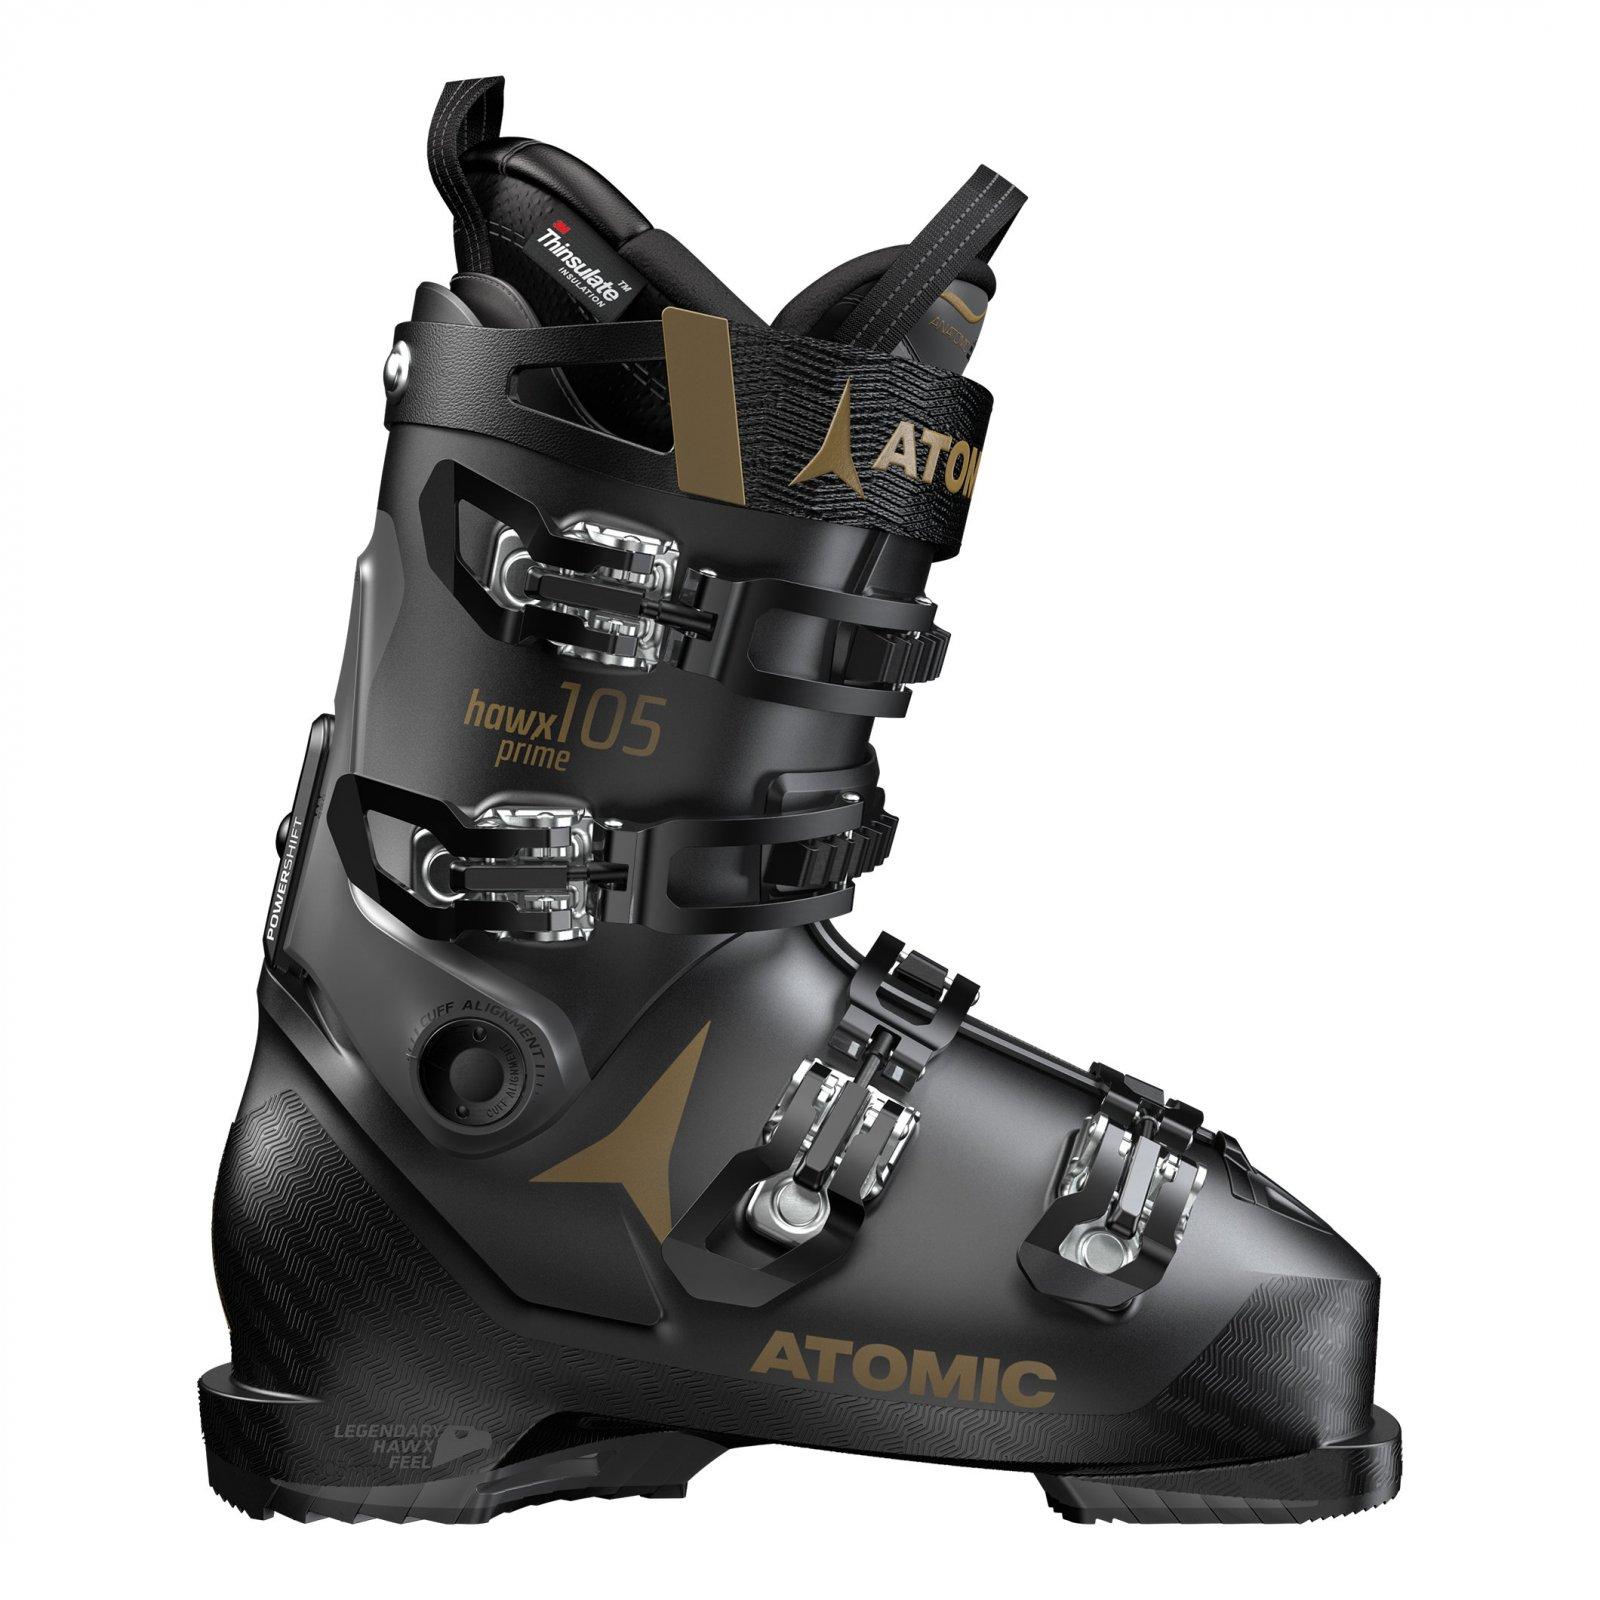 Atomic Prime 105 Women's Ski Boots